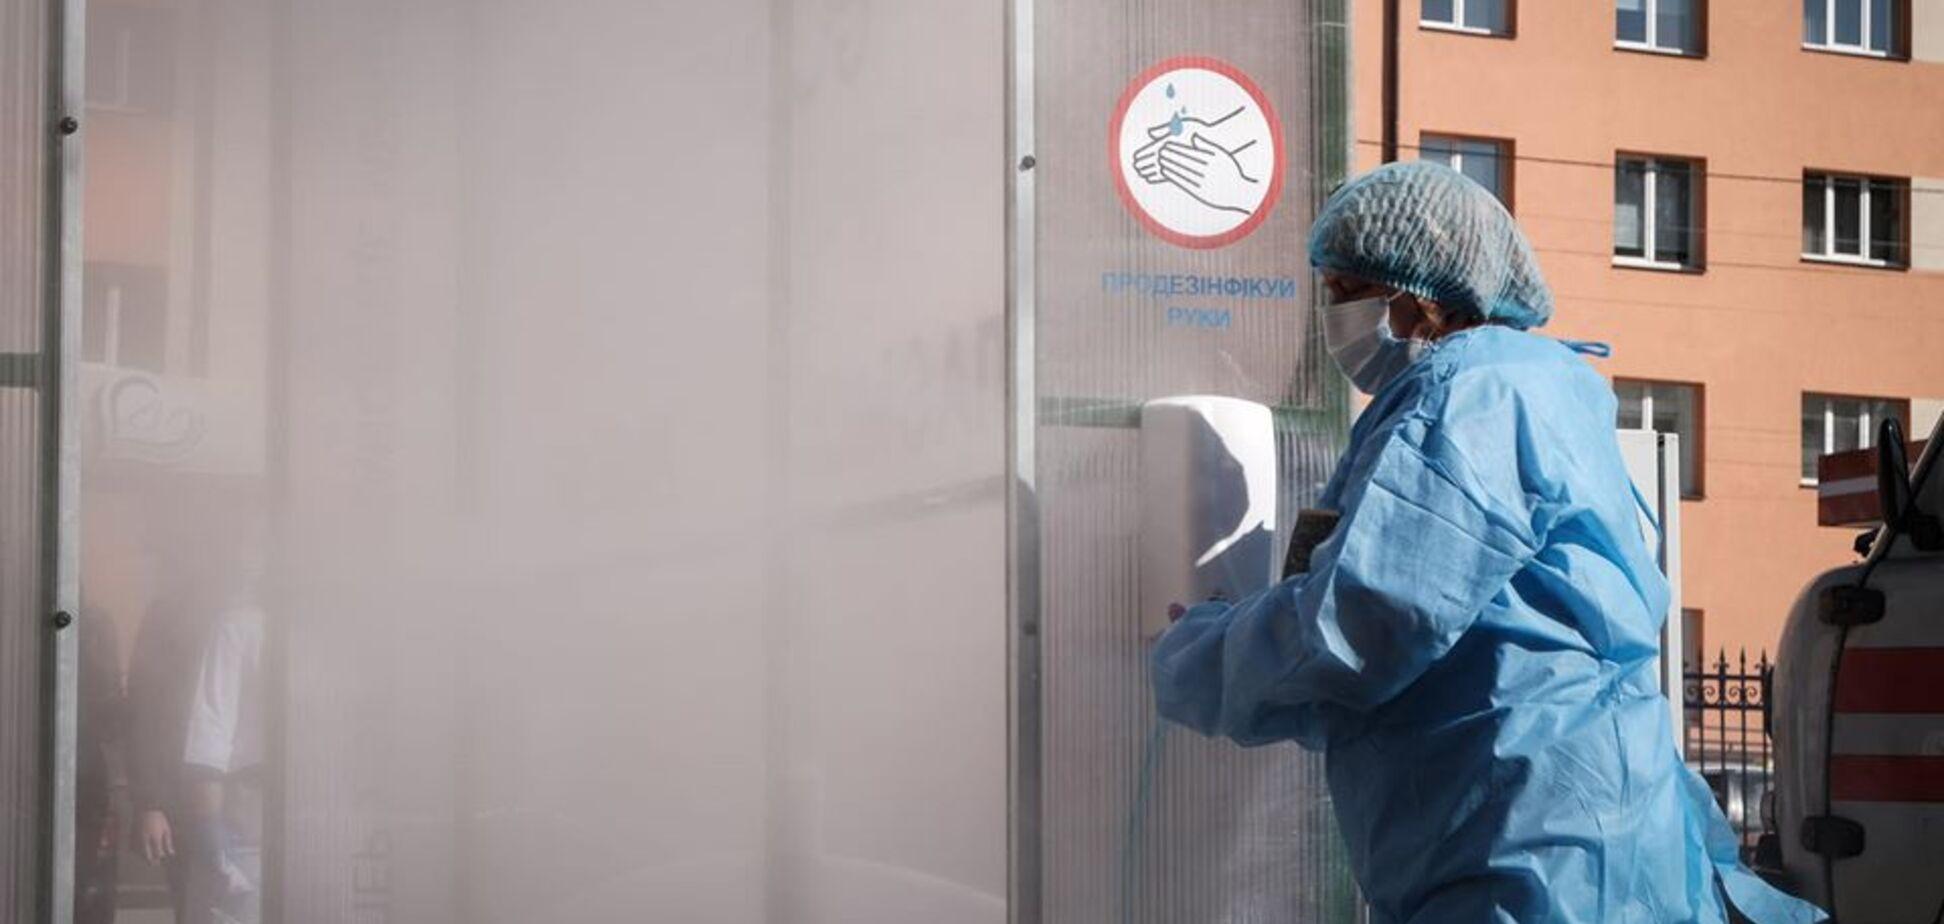 В Черновцах для борьбы с COVID-19 установили 'убийцу бактерий'. Фото